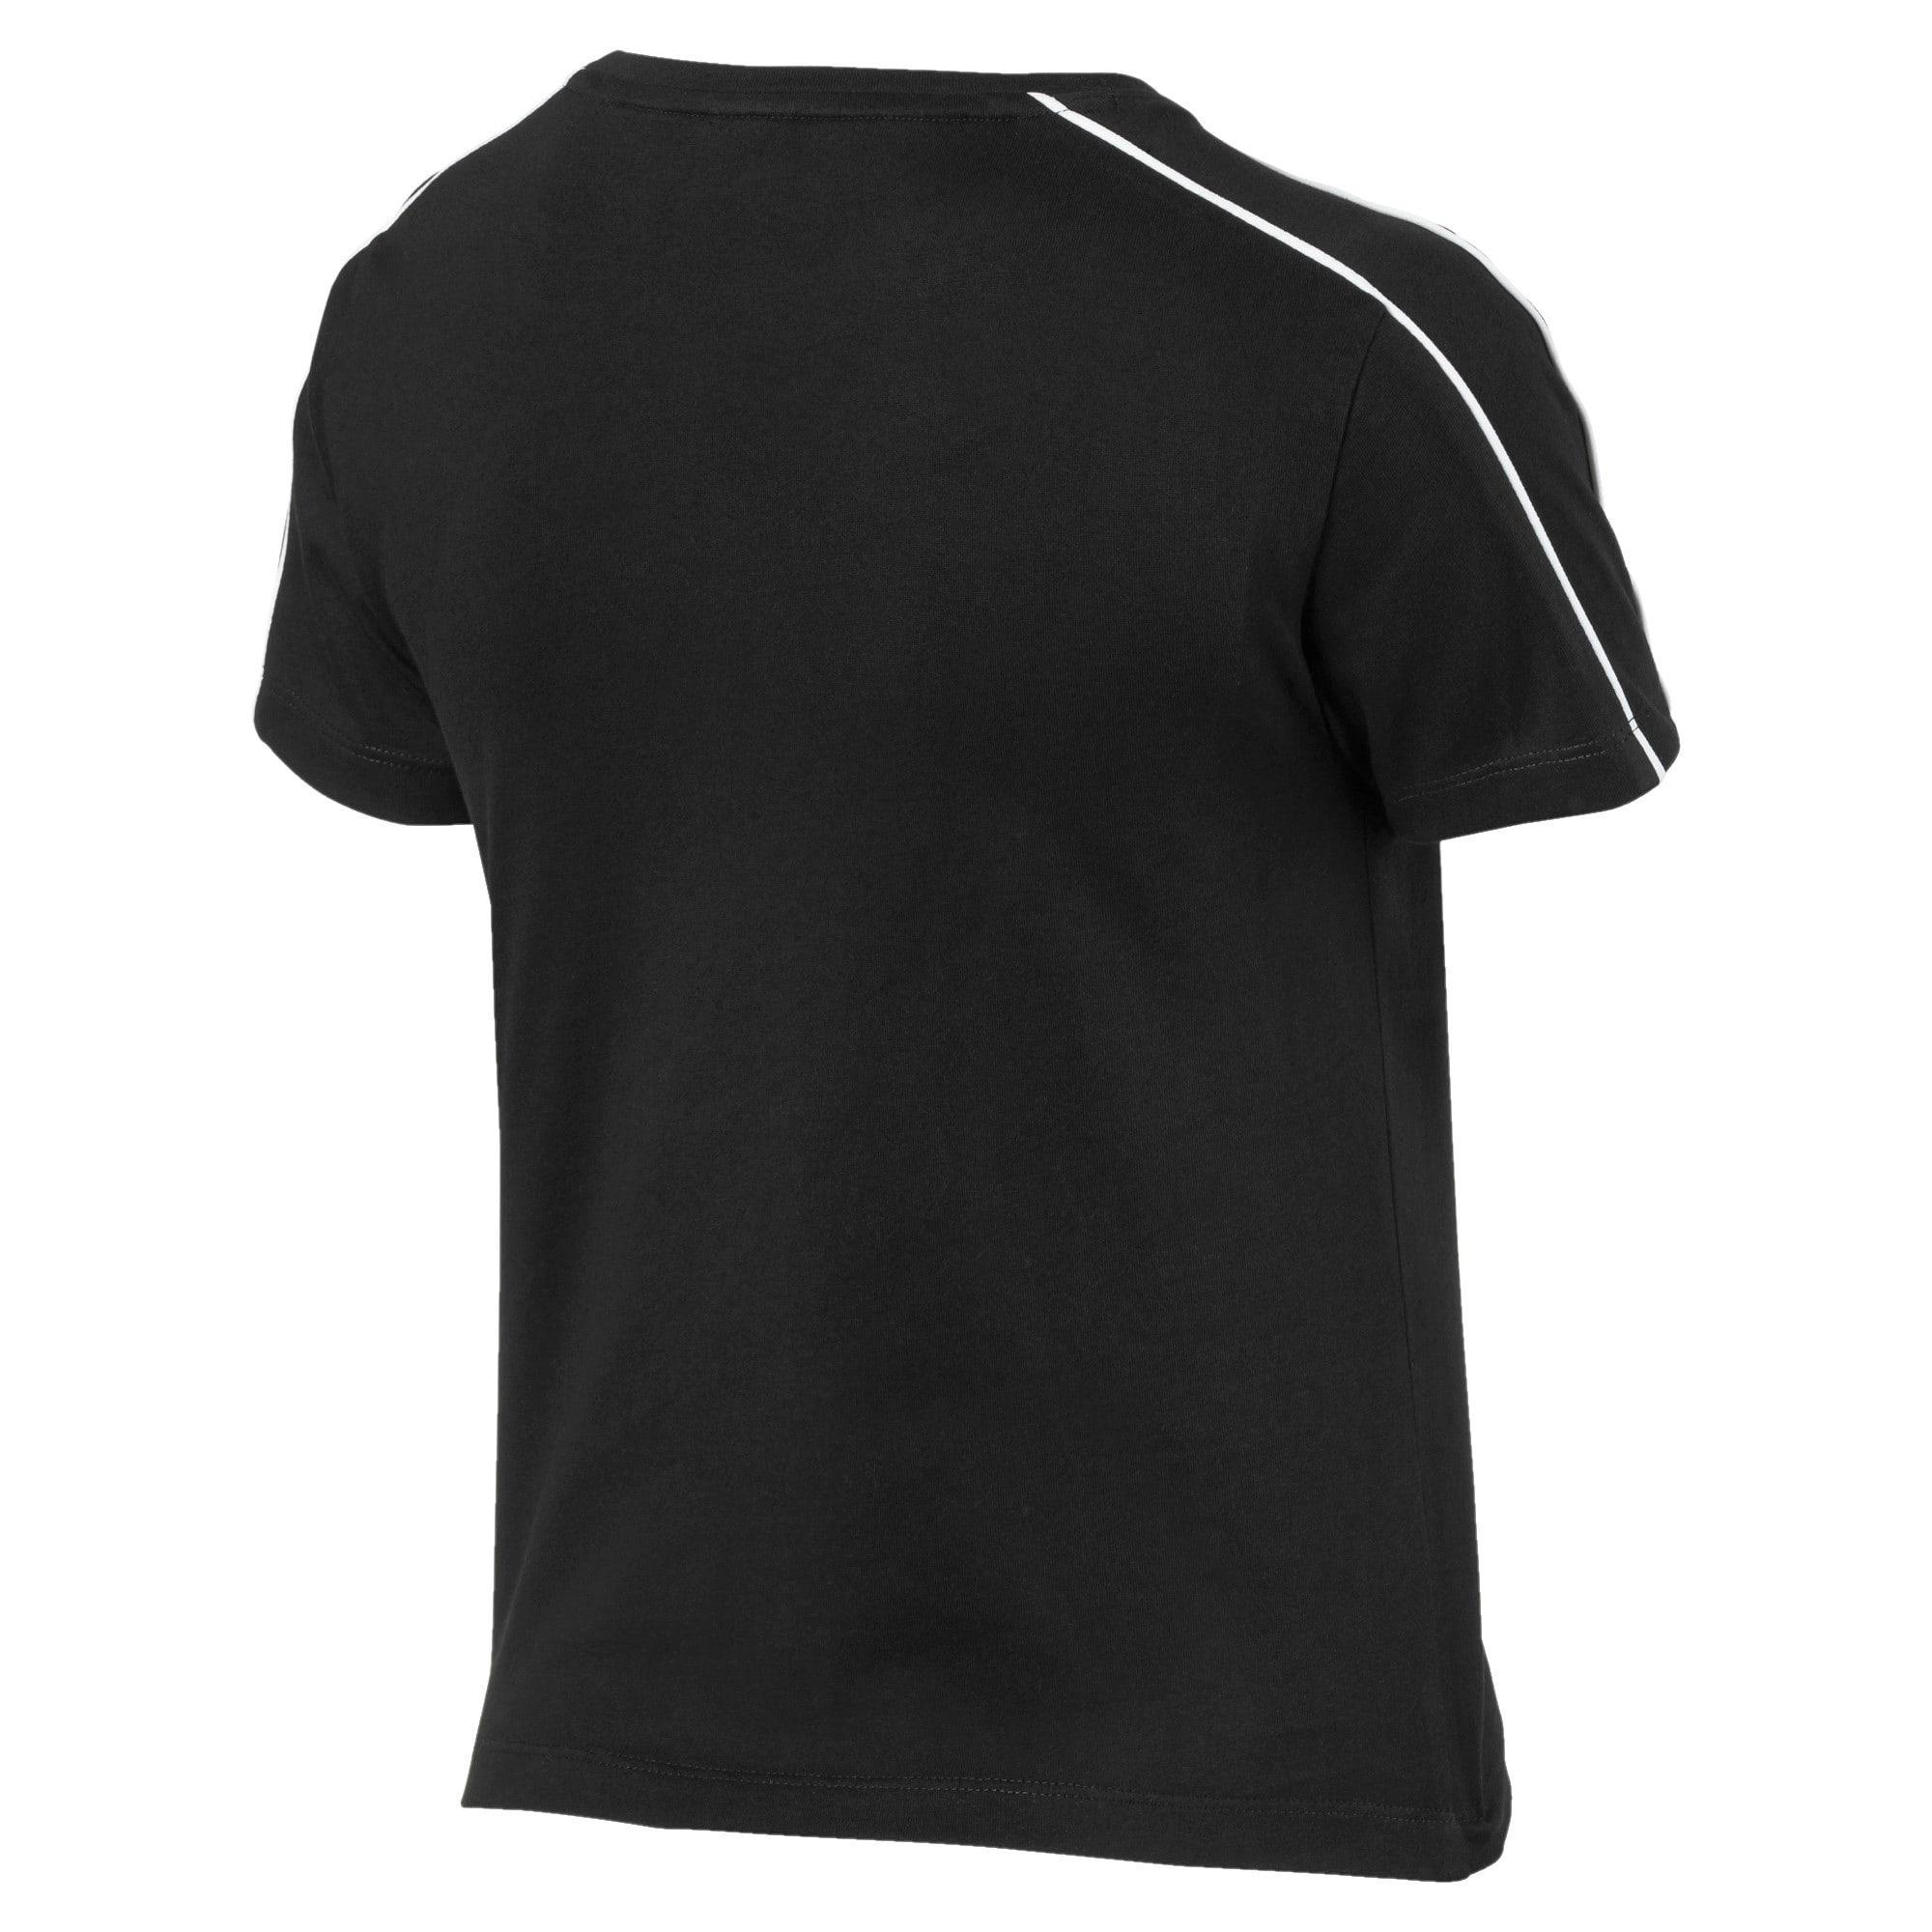 Miniatura 5 de Camiseta Classics Tight para mujer, Puma Black, mediano